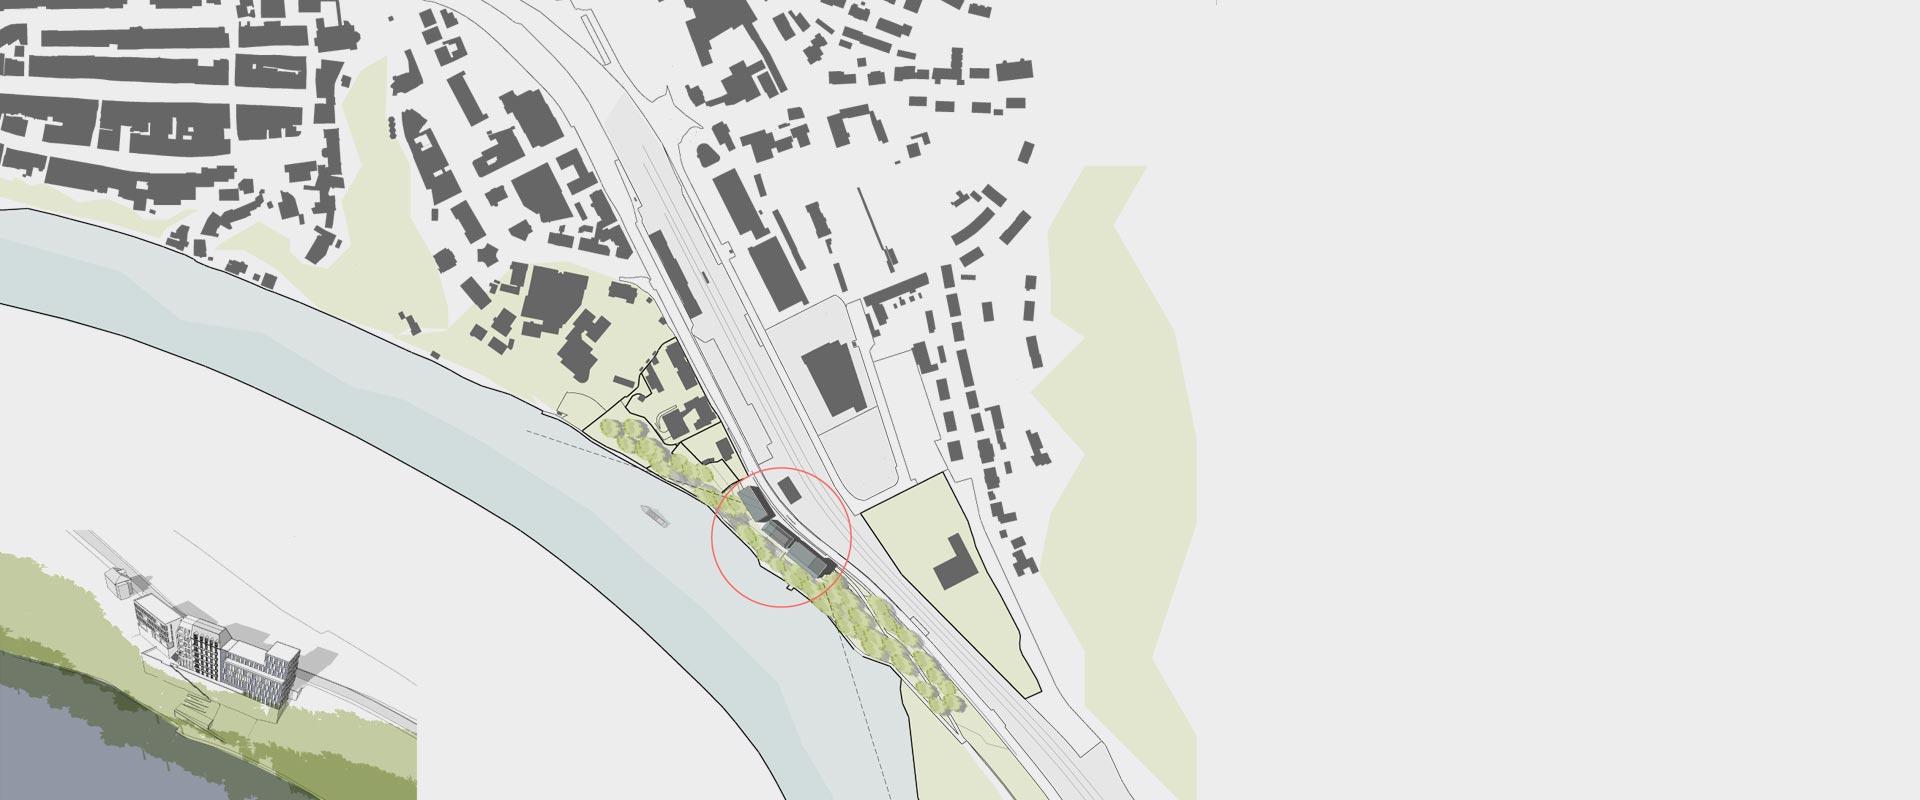 architekturbuero_henning_musahl_waldshut_stadtschloss_01